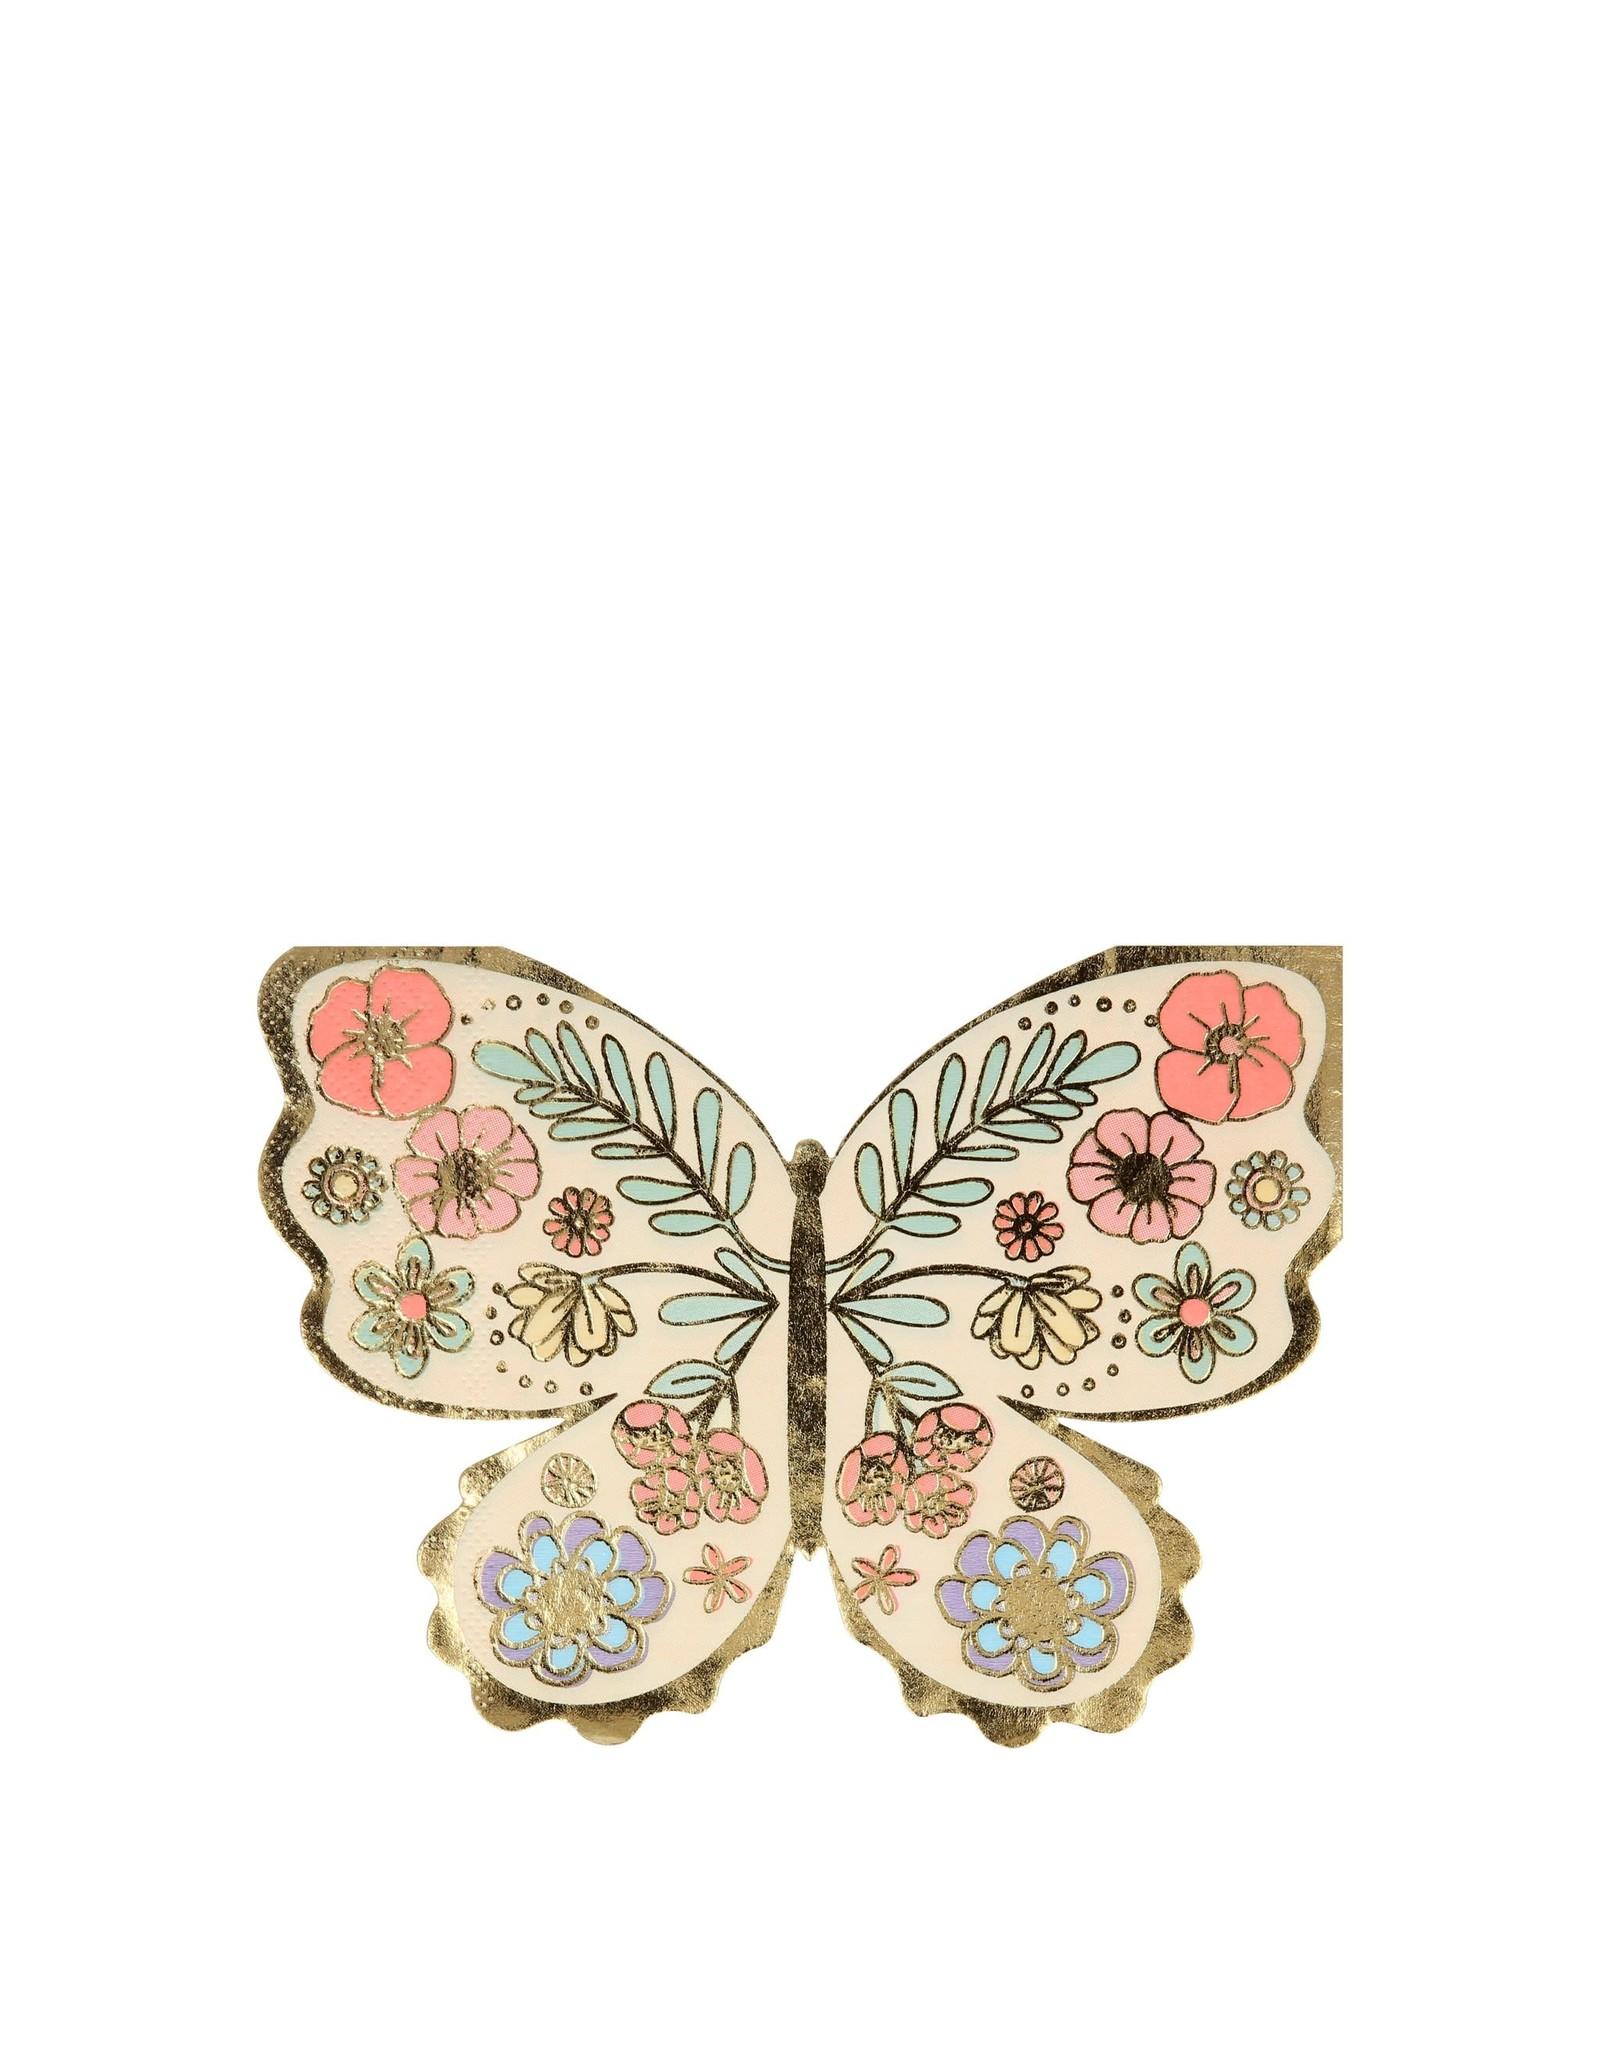 Meri Meri Floral Butterfly Napkins